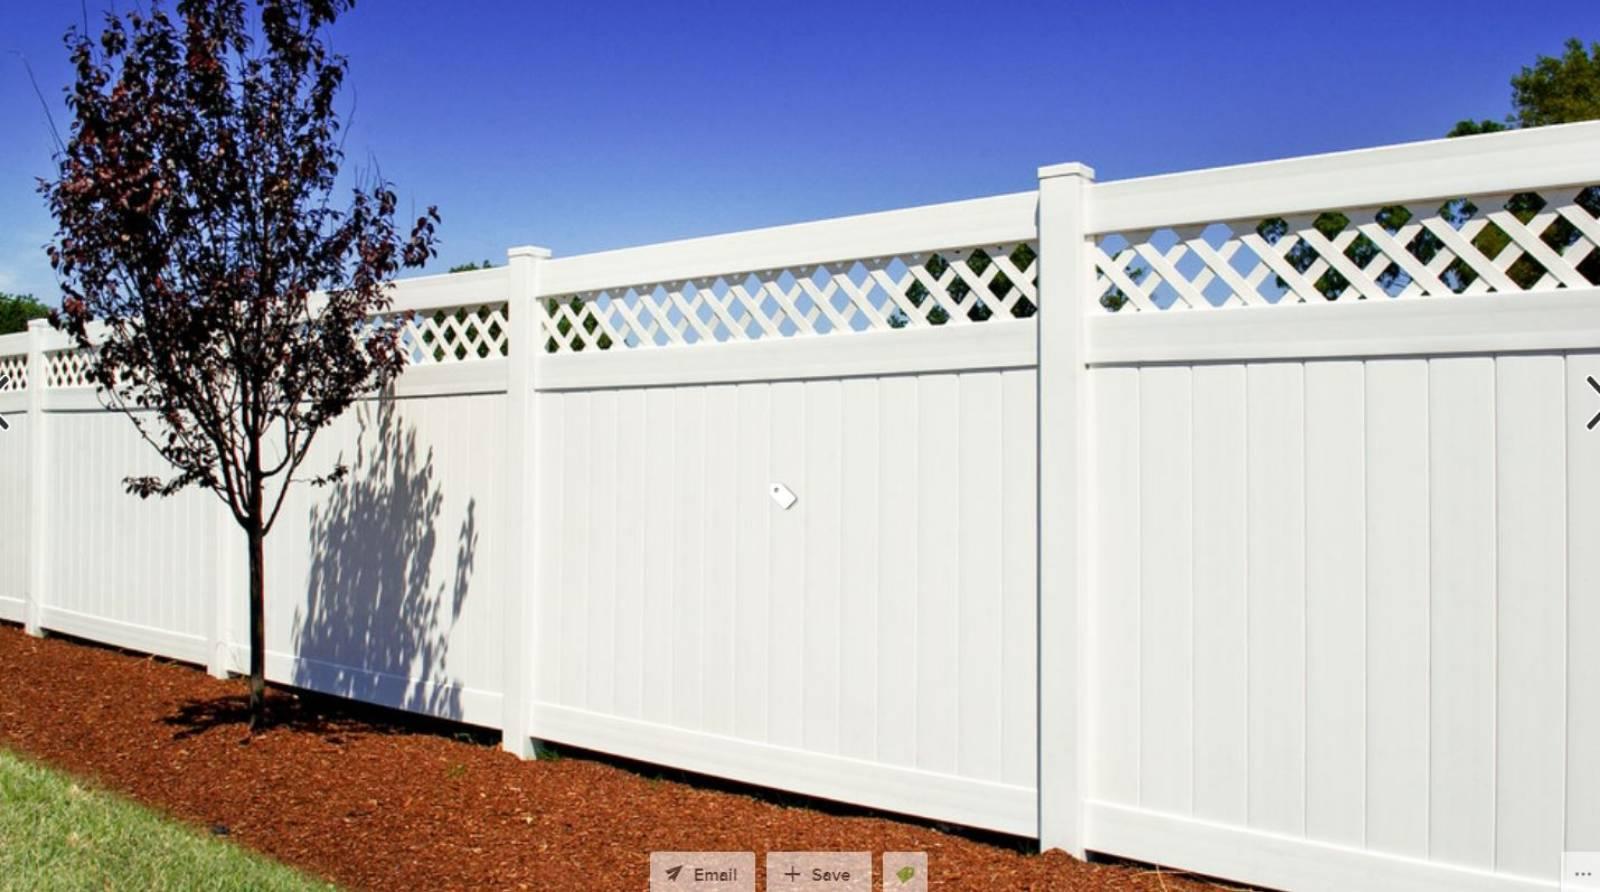 PVC/Vinyl Fencing